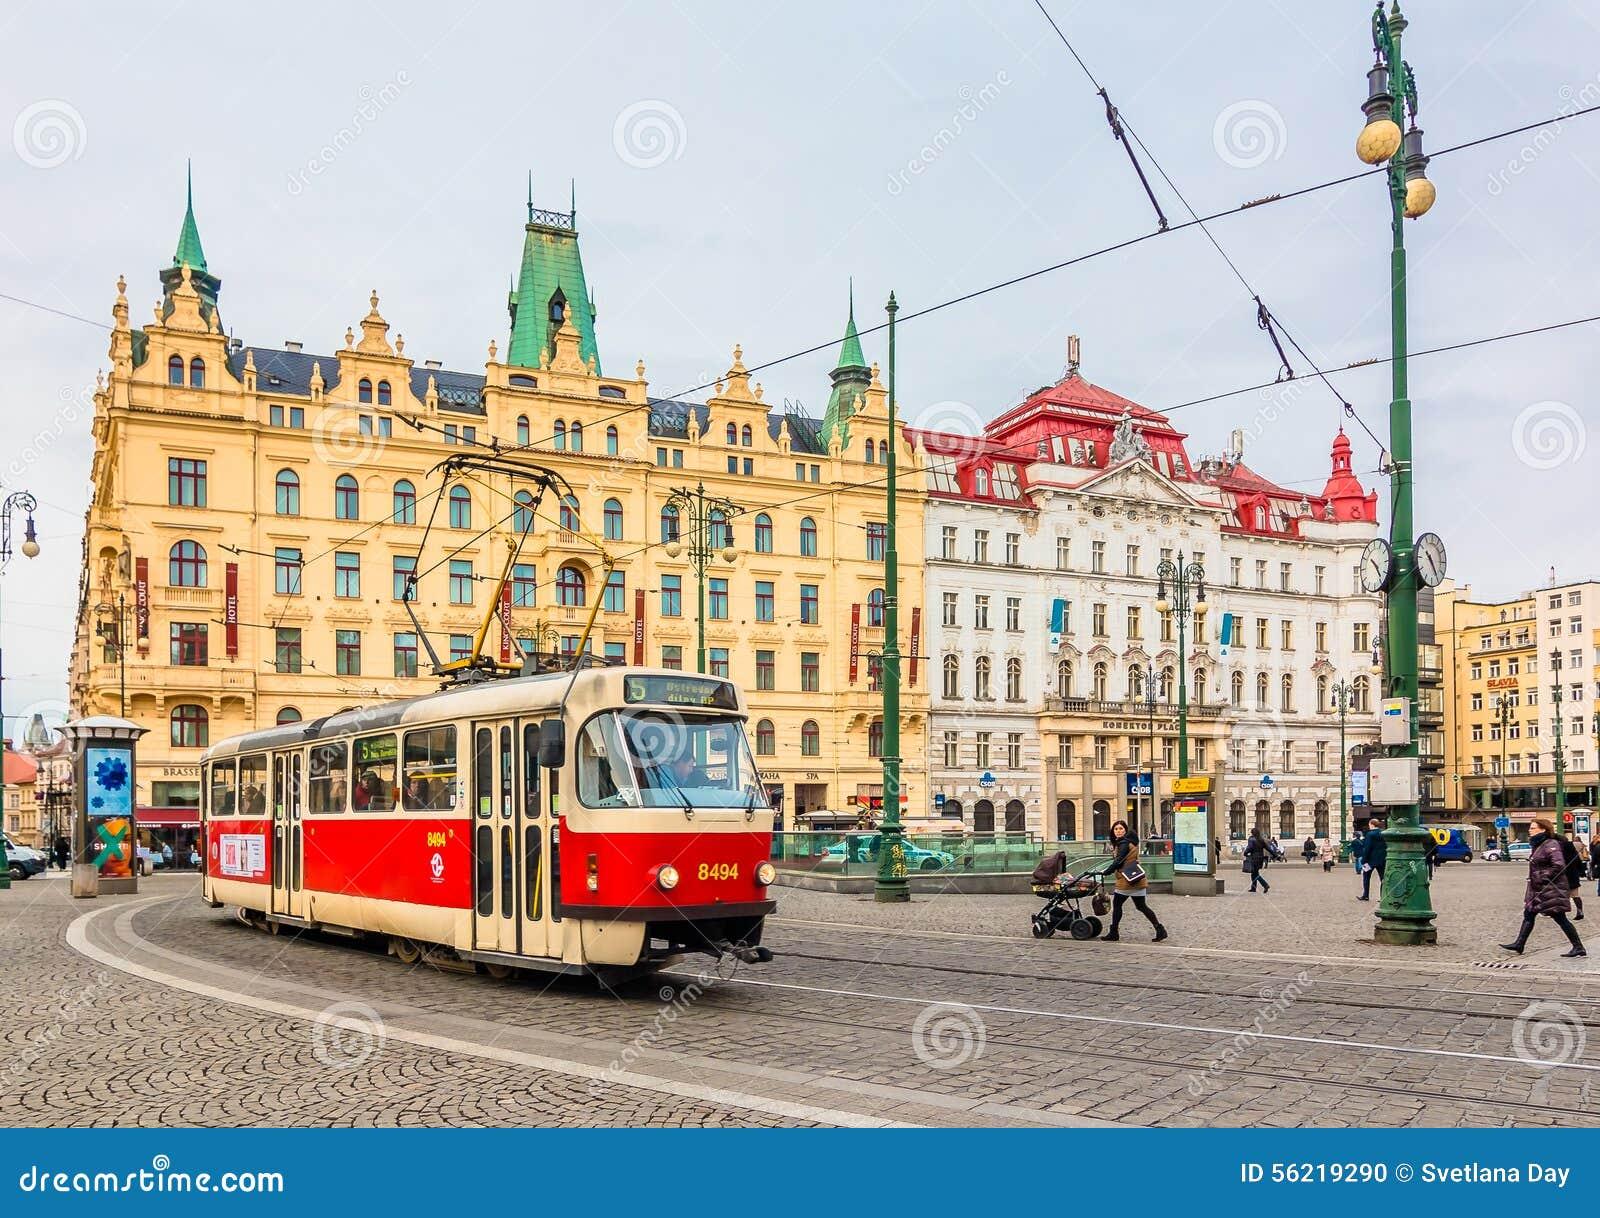 old tram prague street - photo #43